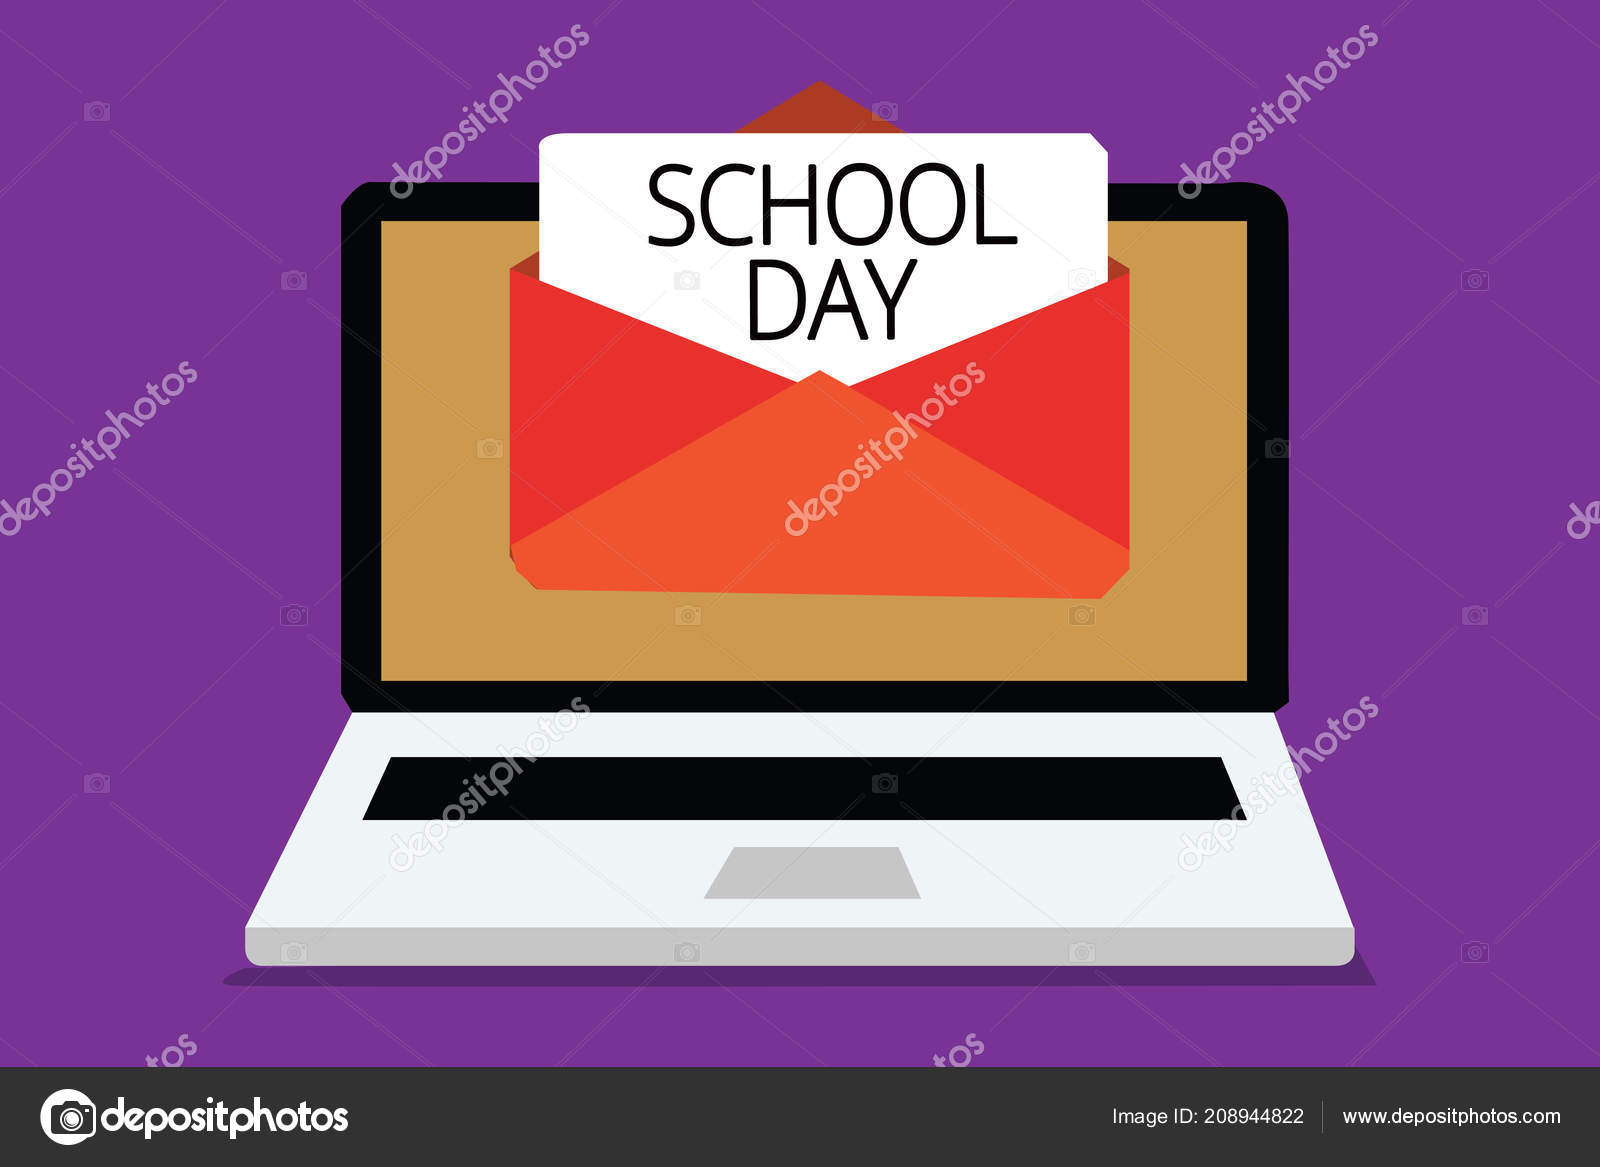 496d578675 Χειρόγραφο Κείμενο Γράφοντας Σχολικής Ημέρας Έννοια Έννοια Ξεκινά Από Επτά  — Φωτογραφία Αρχείου